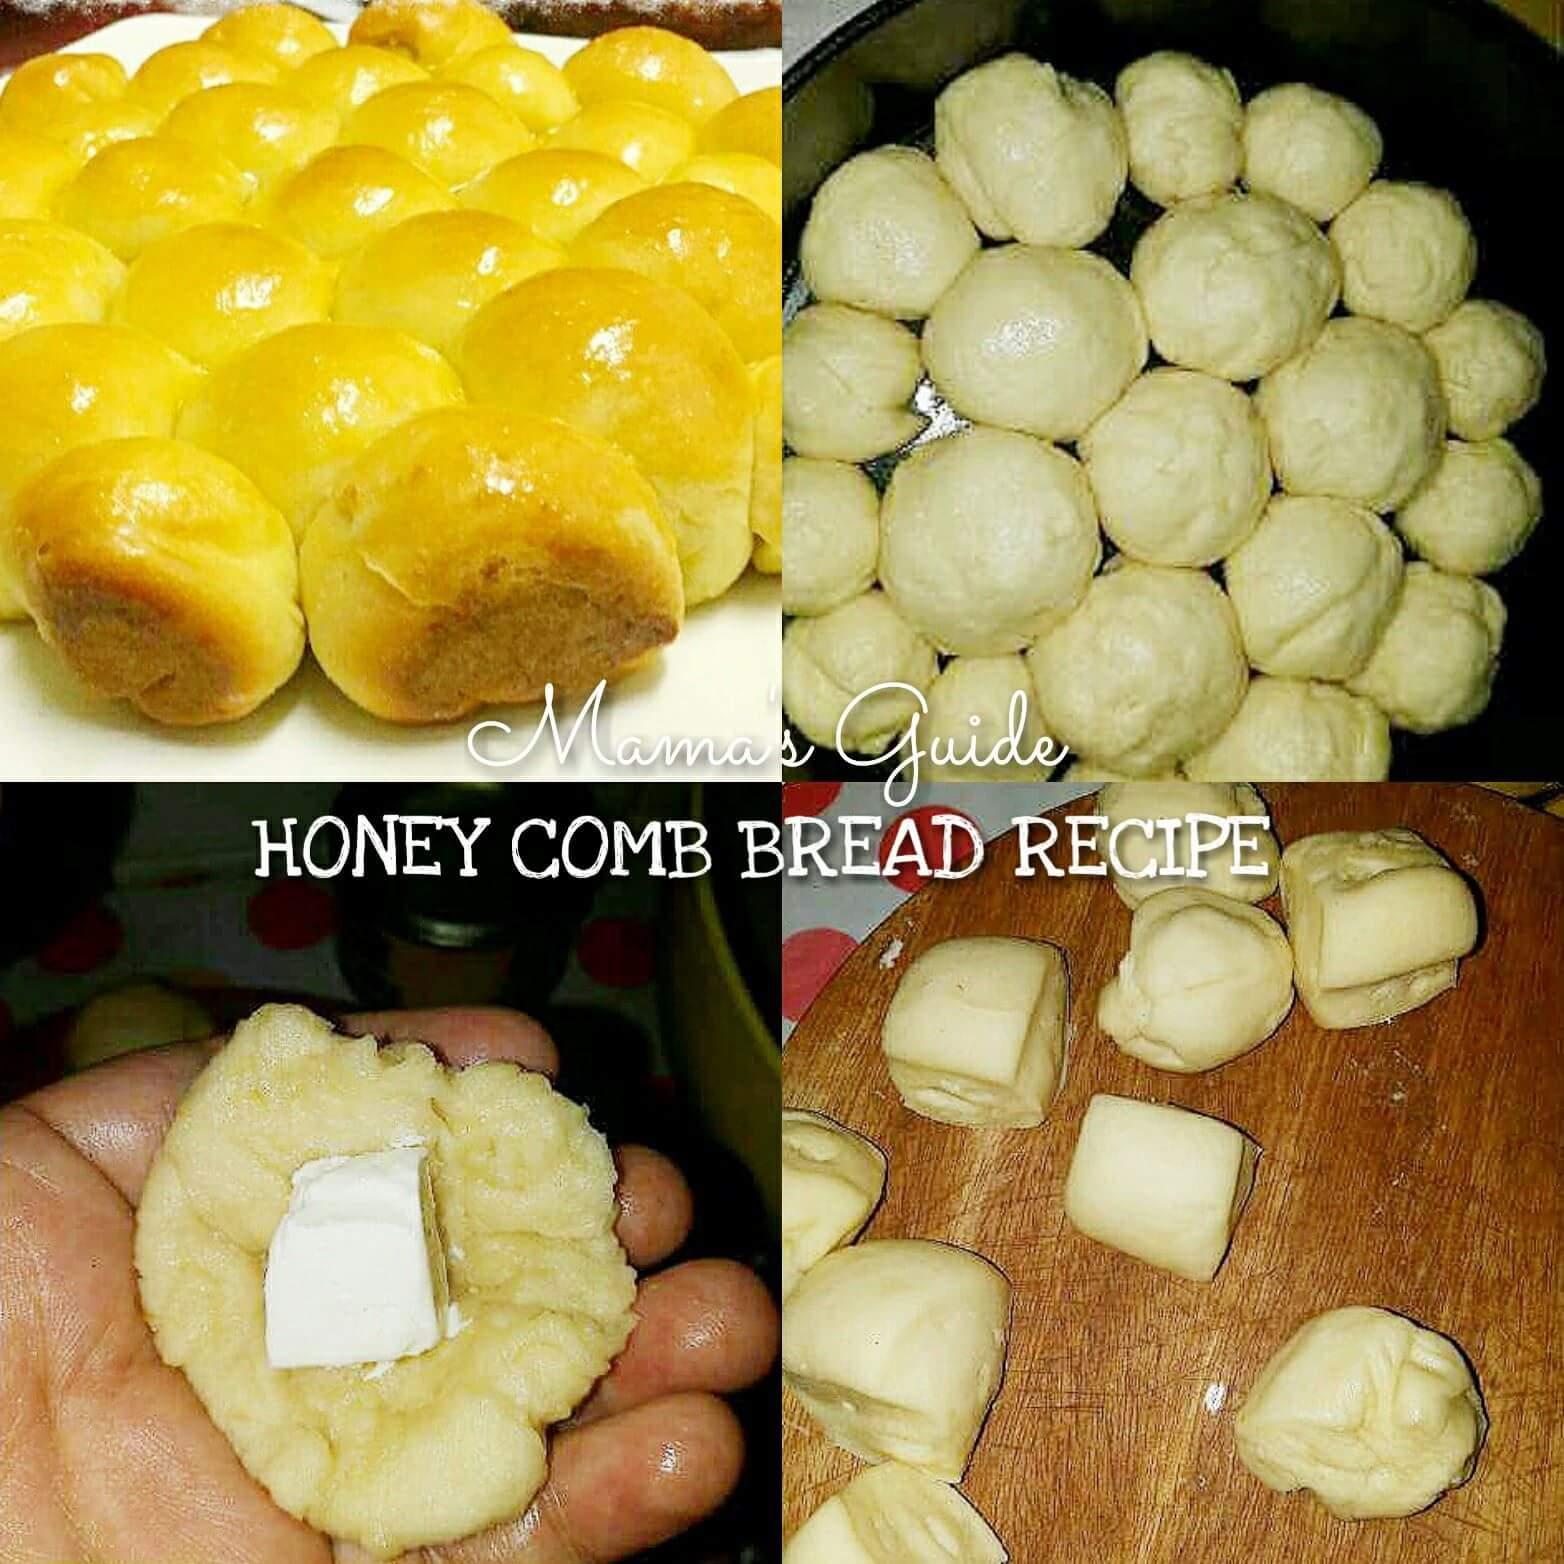 Honeycomb Bread Recipe